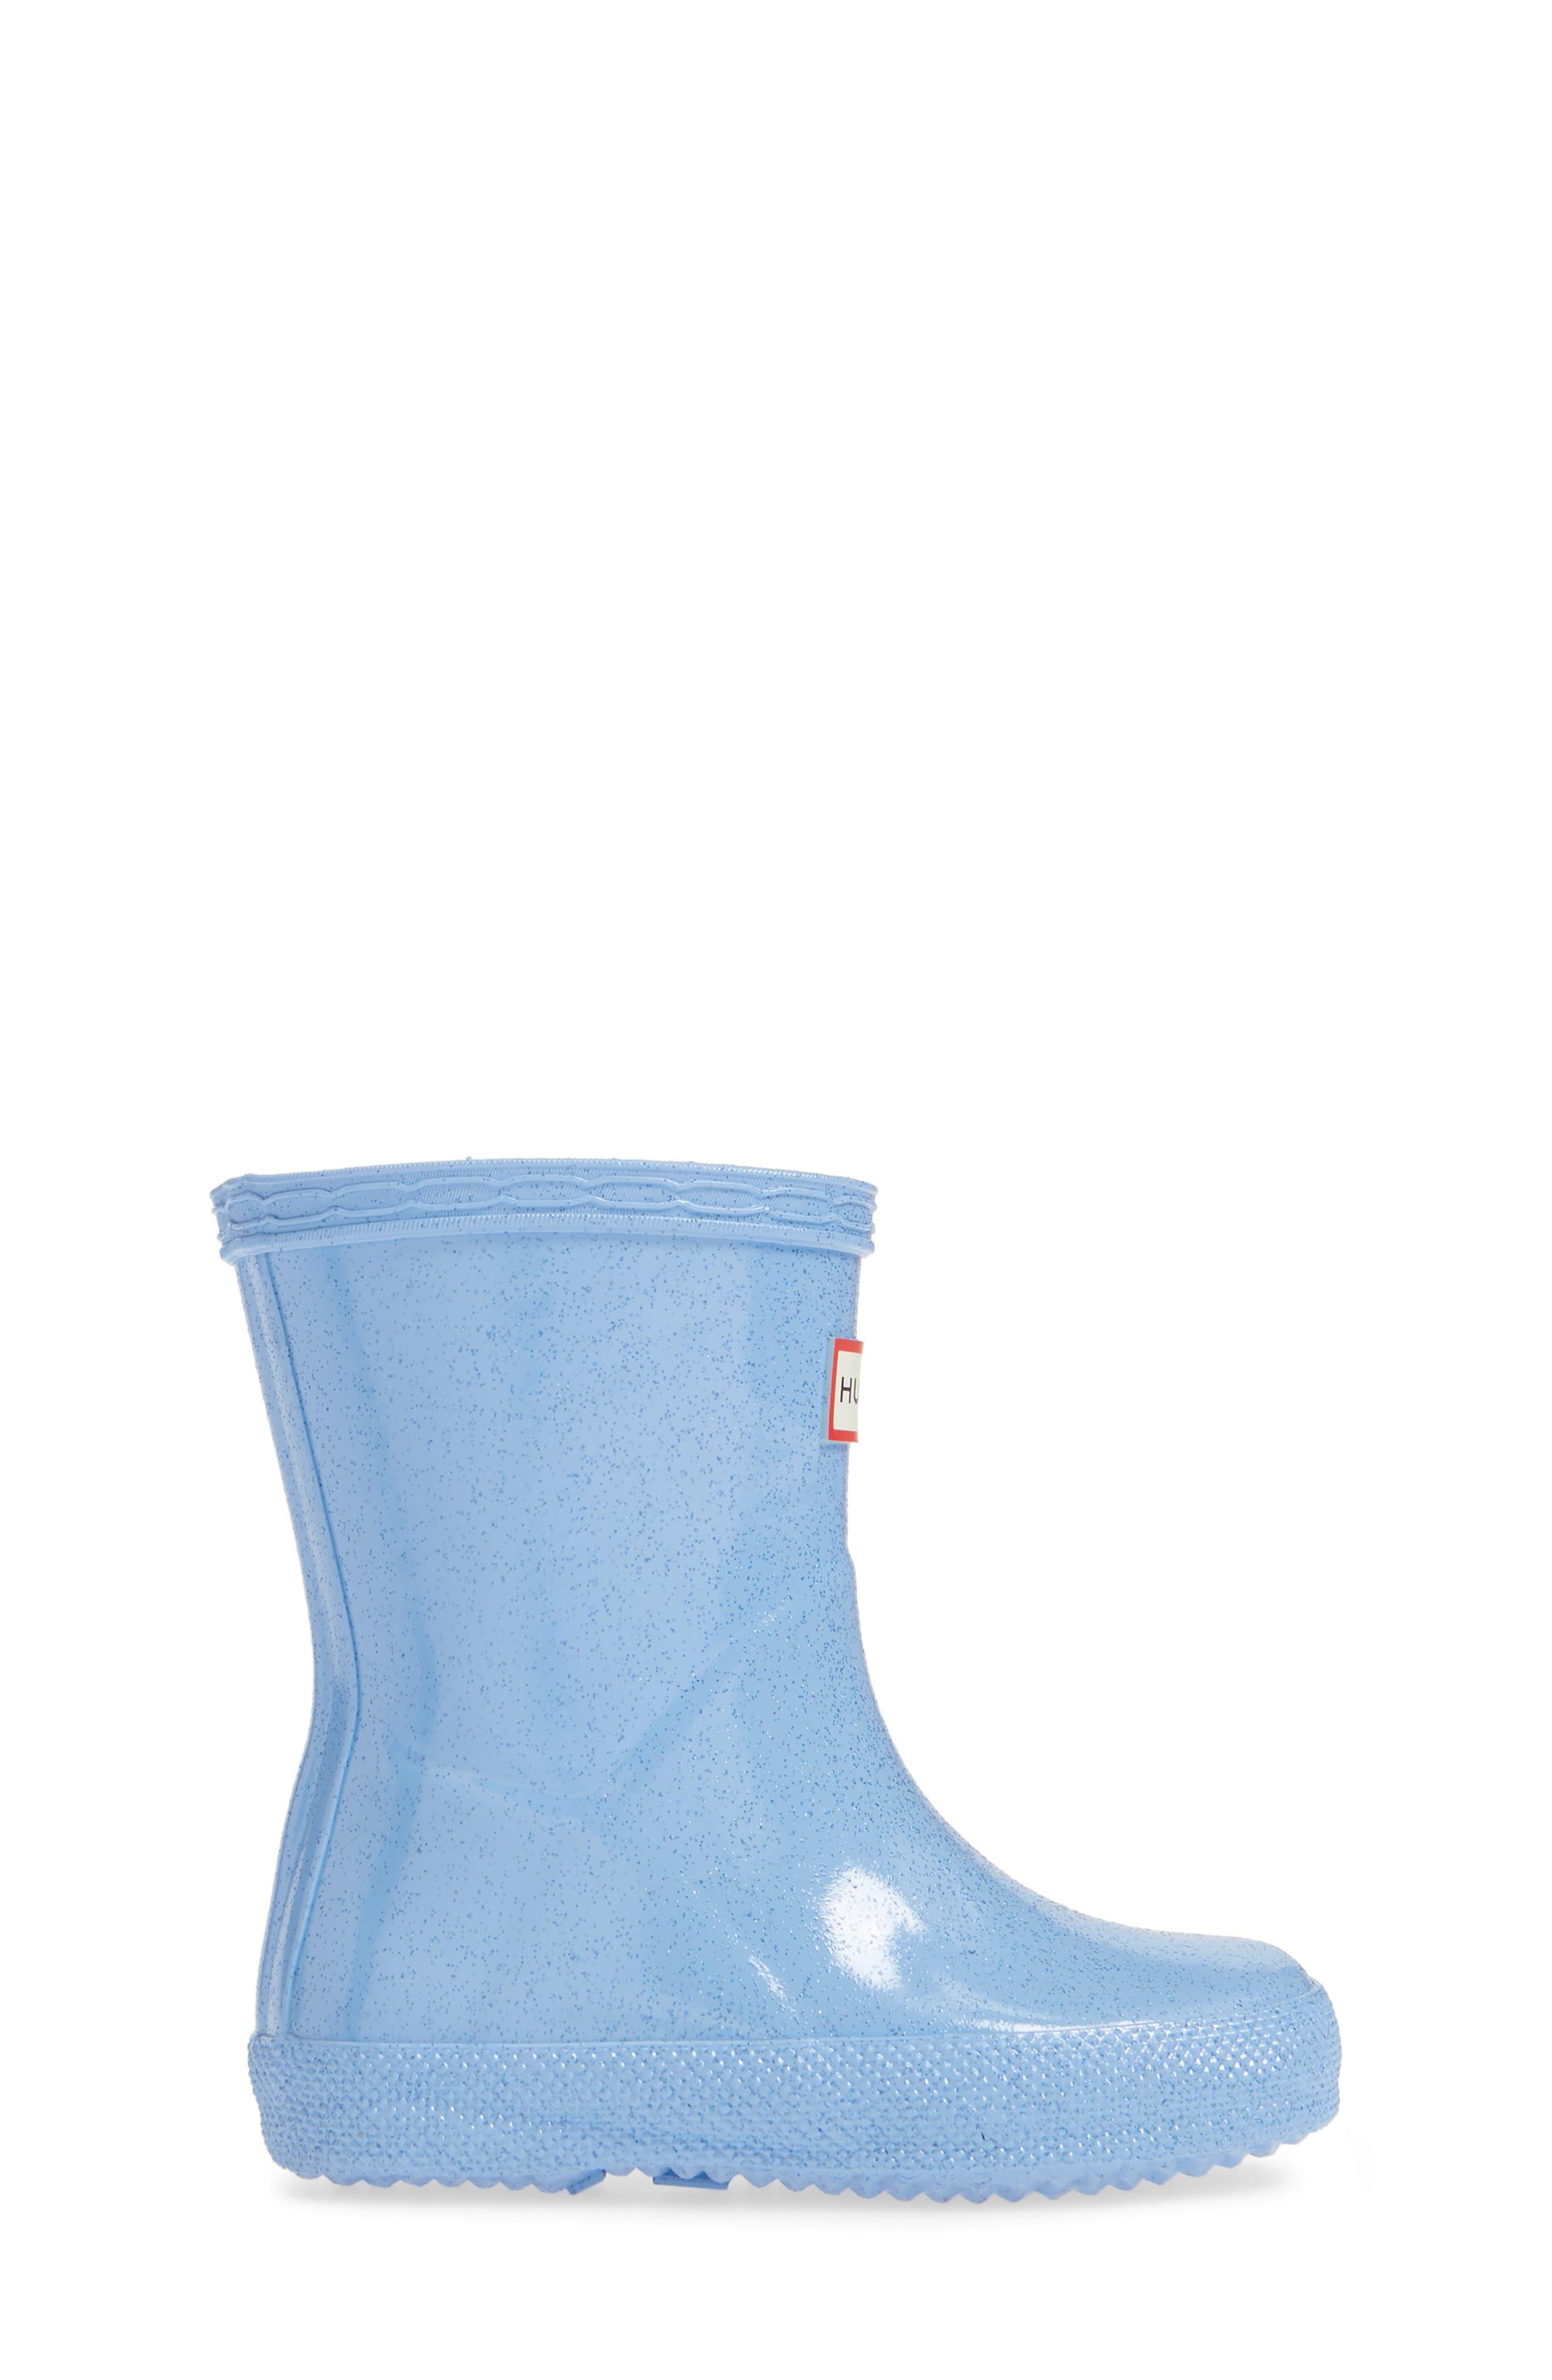 Kids First Classic Starcloud Glitter Rain Boot,                             Alternate thumbnail 3, color,                             VIVID BLUE